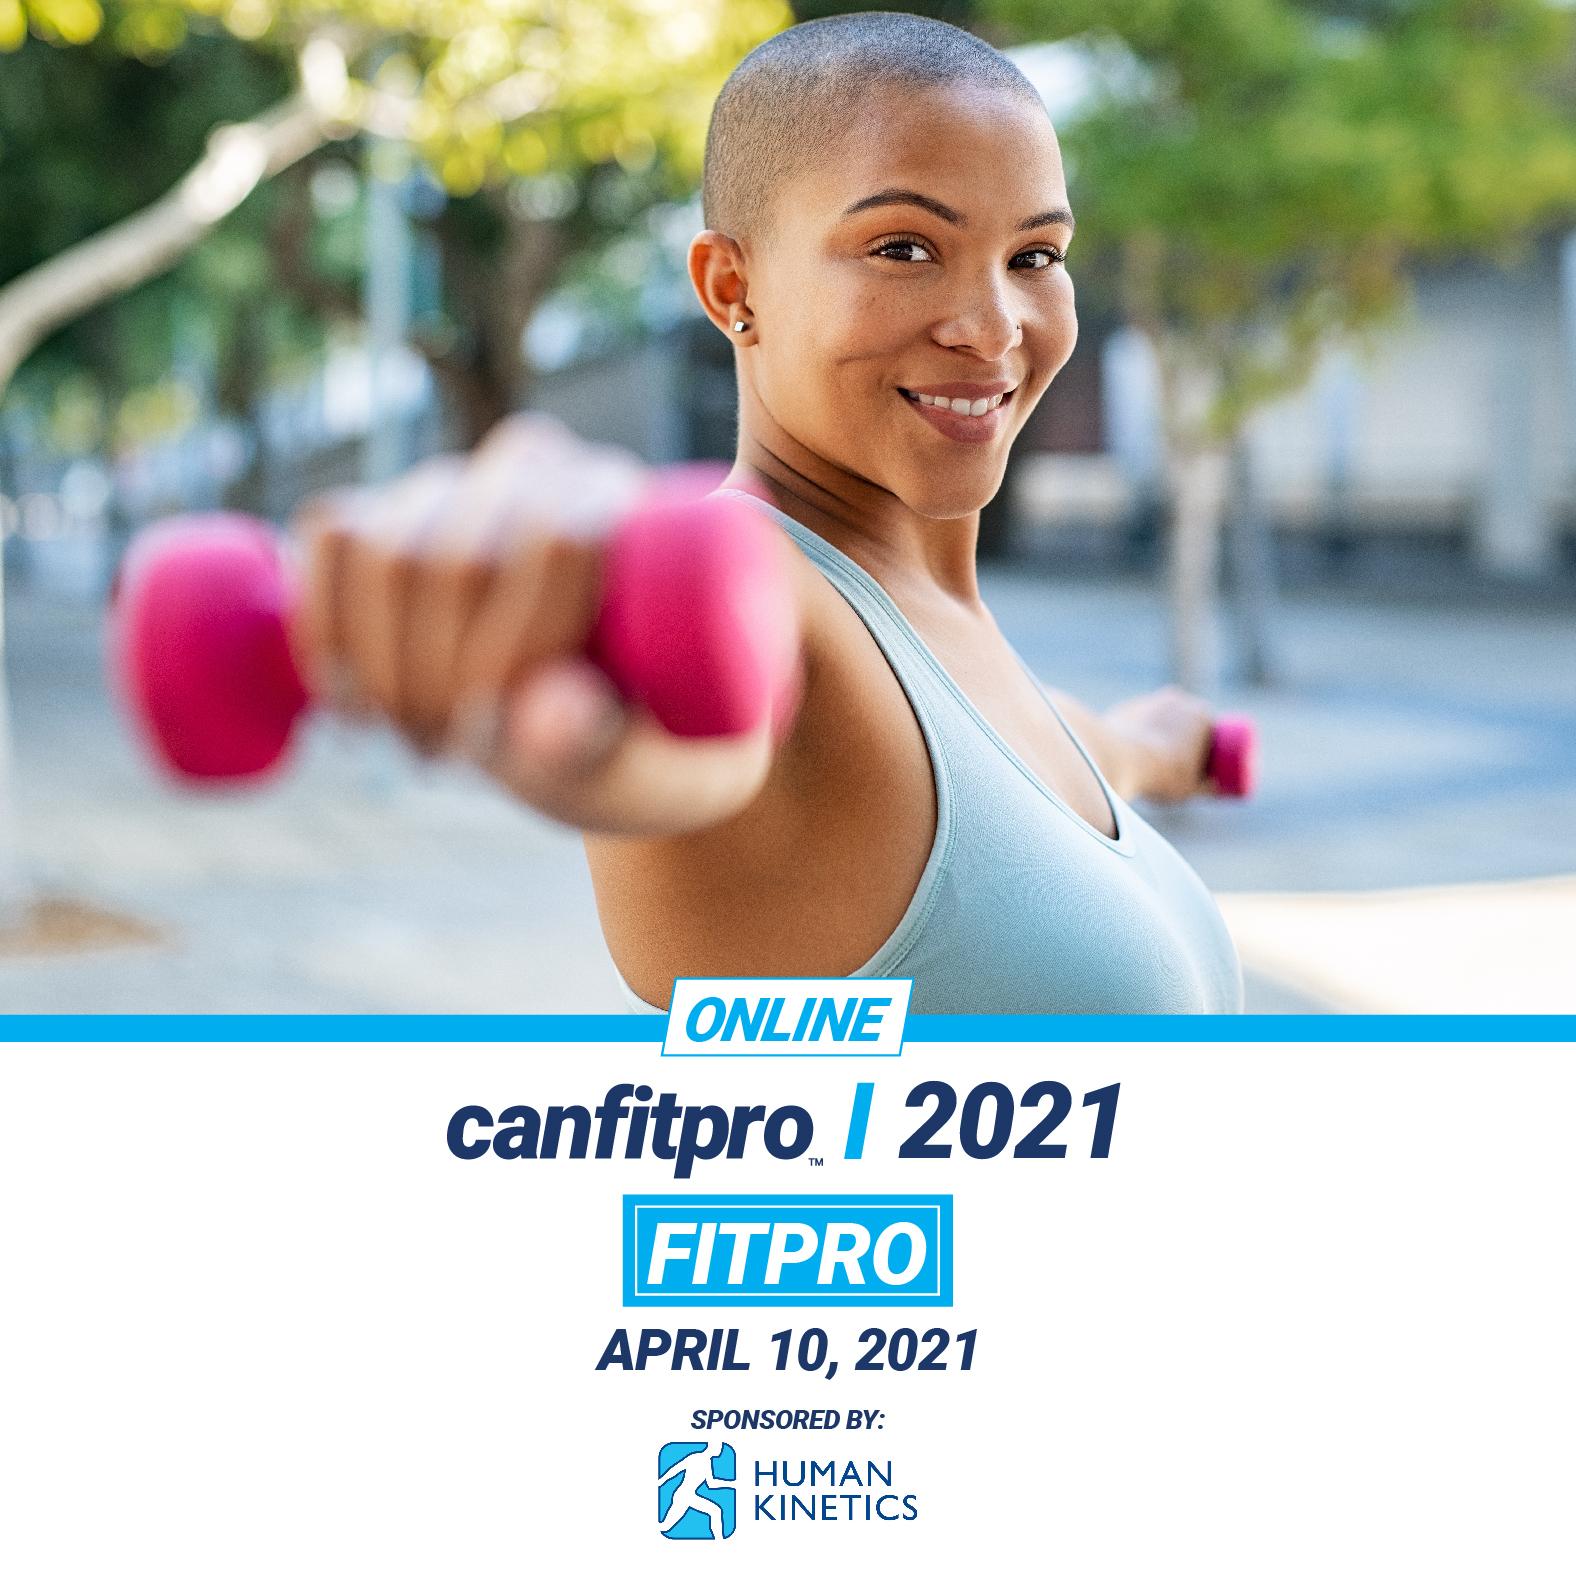 canfitpro events 2021 | FitPro